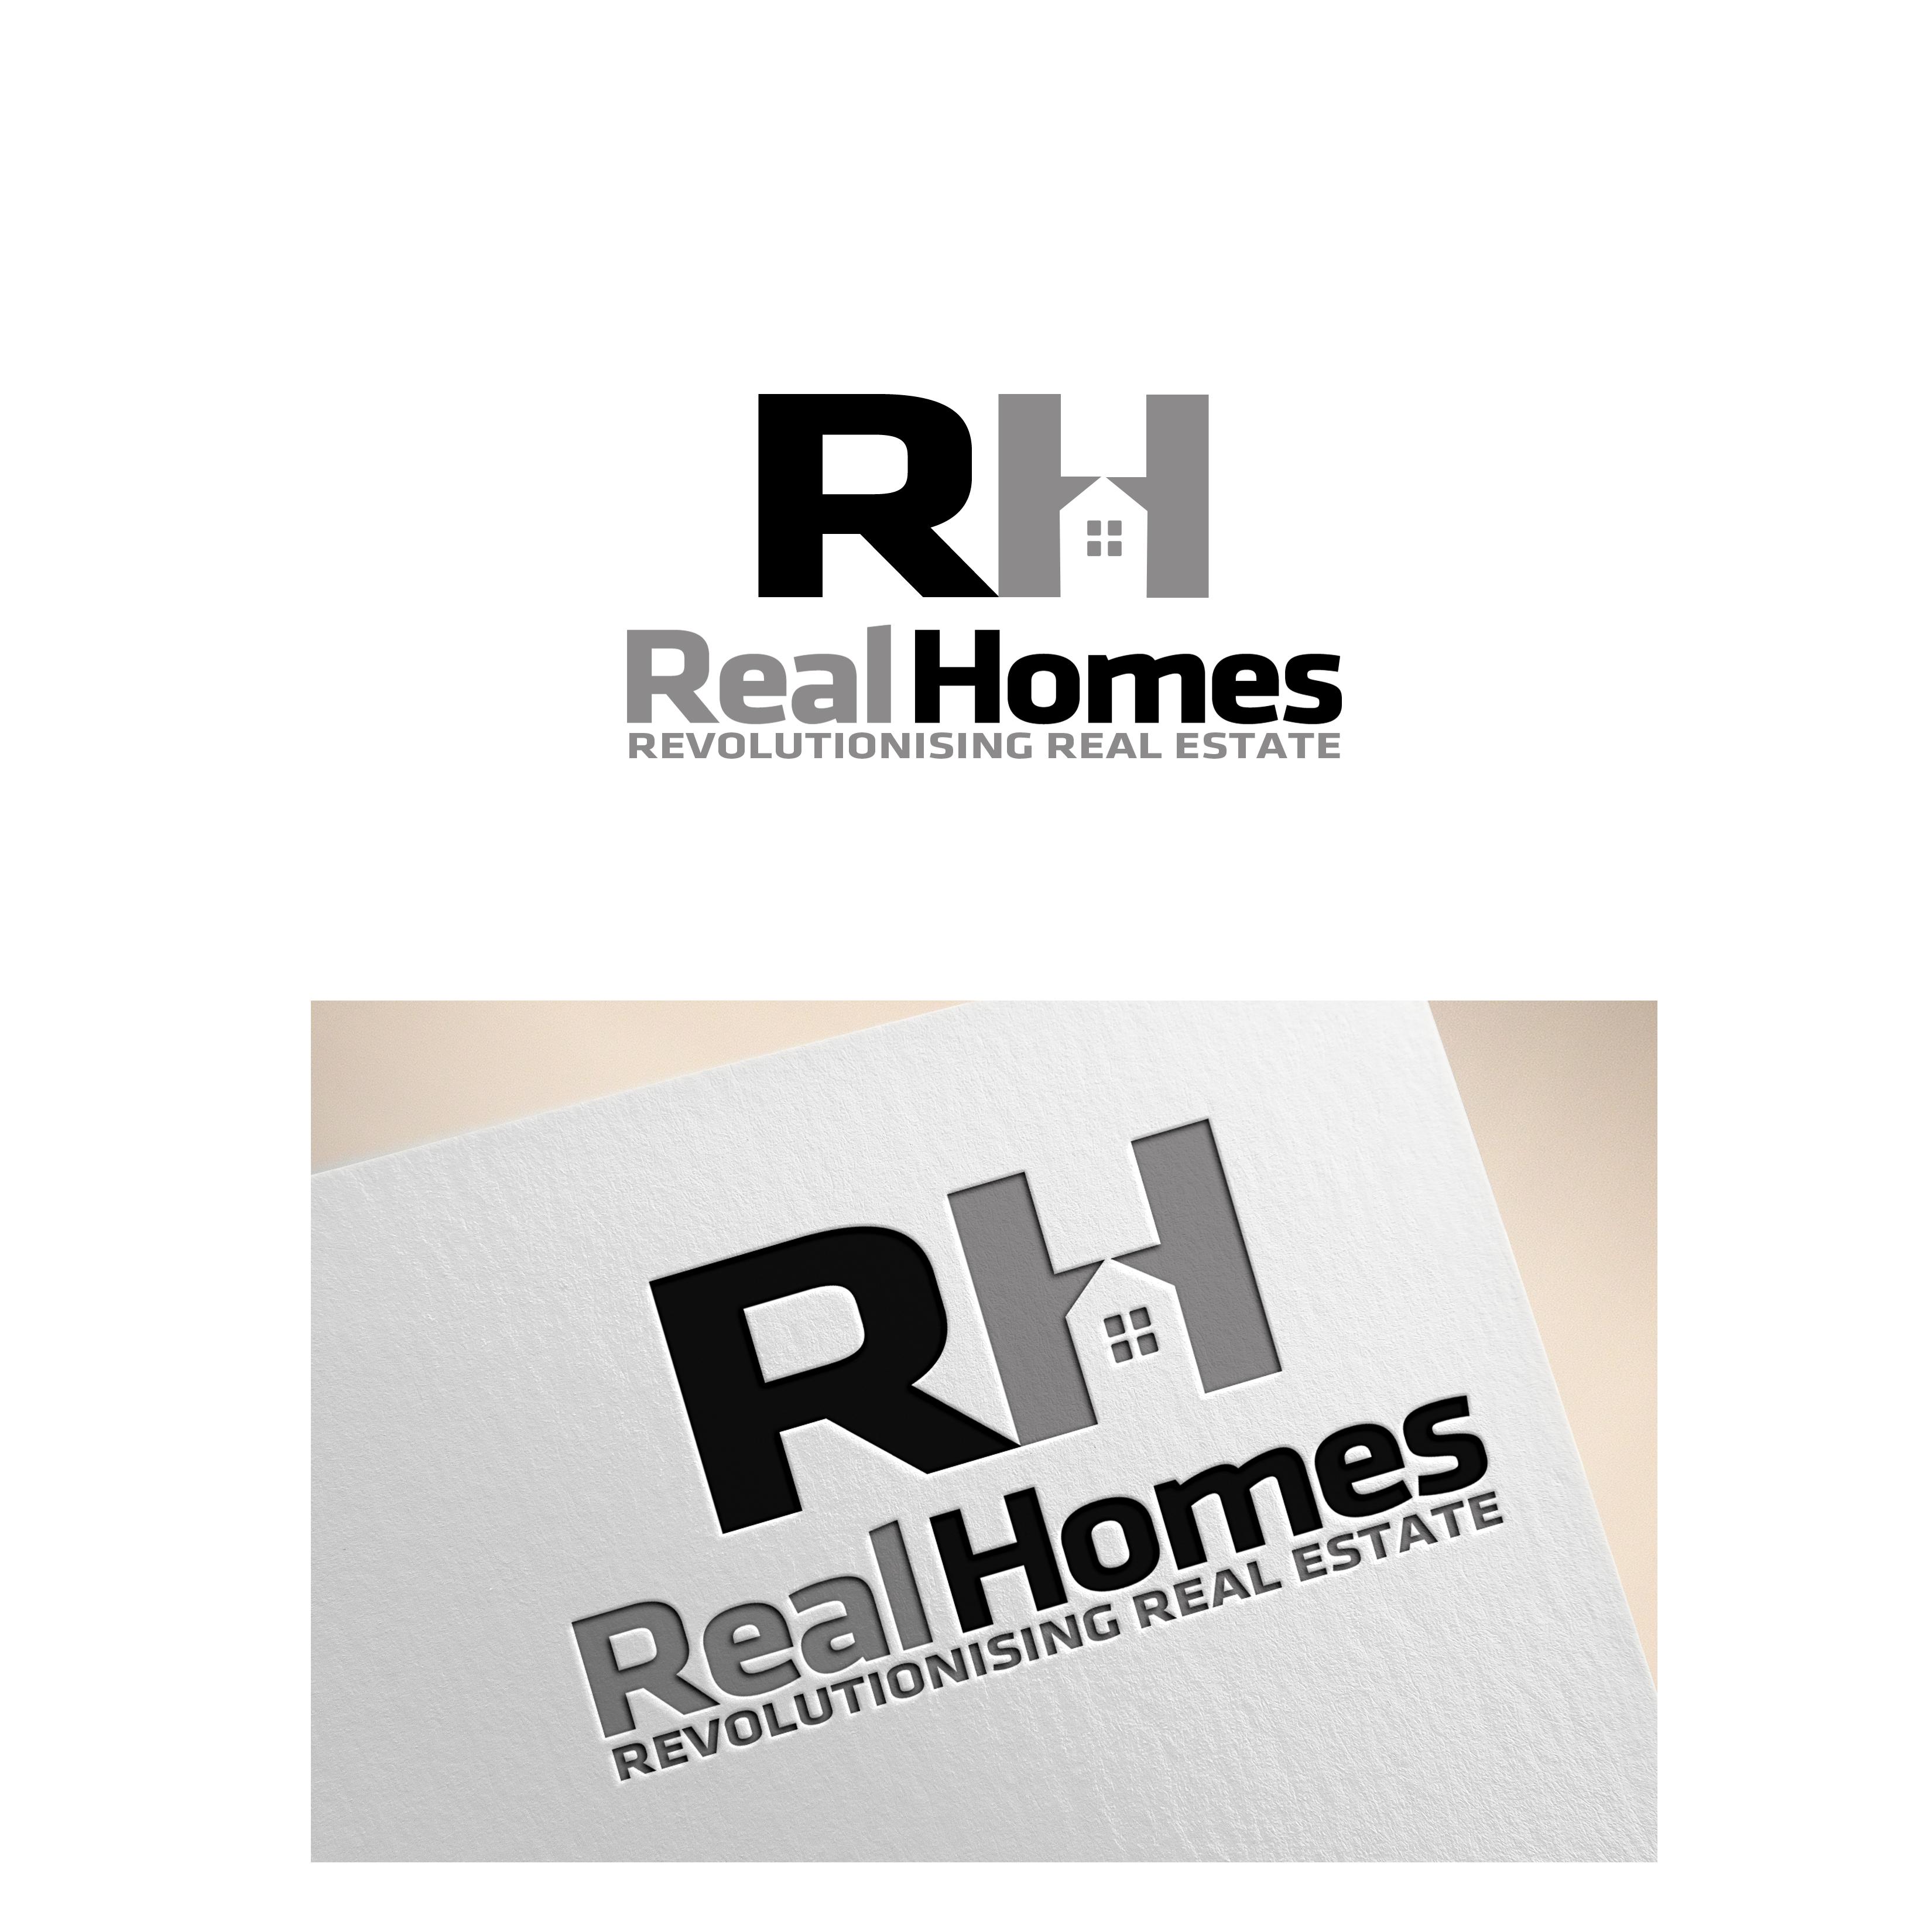 Logo Design by Allan Esclamado - Entry No. 251 in the Logo Design Contest Captivating Logo Design for Real Homes.